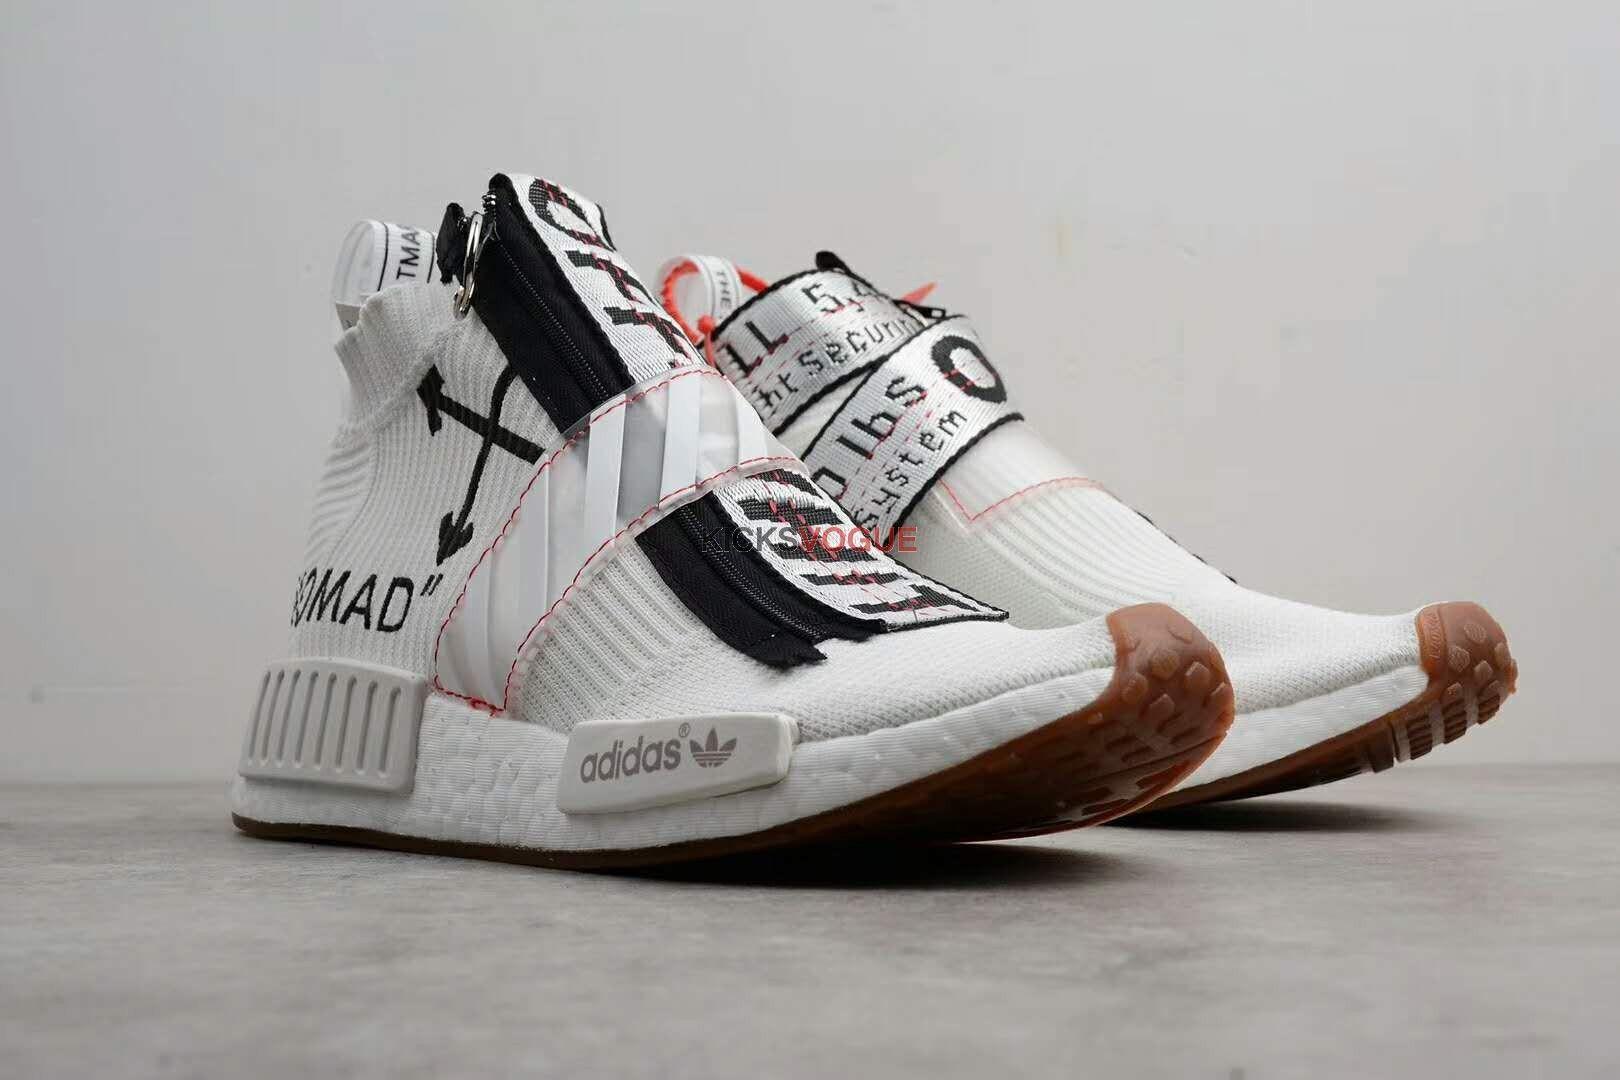 Adidas NMD City Sock OFF WHITE noir et blanc Achat Vente